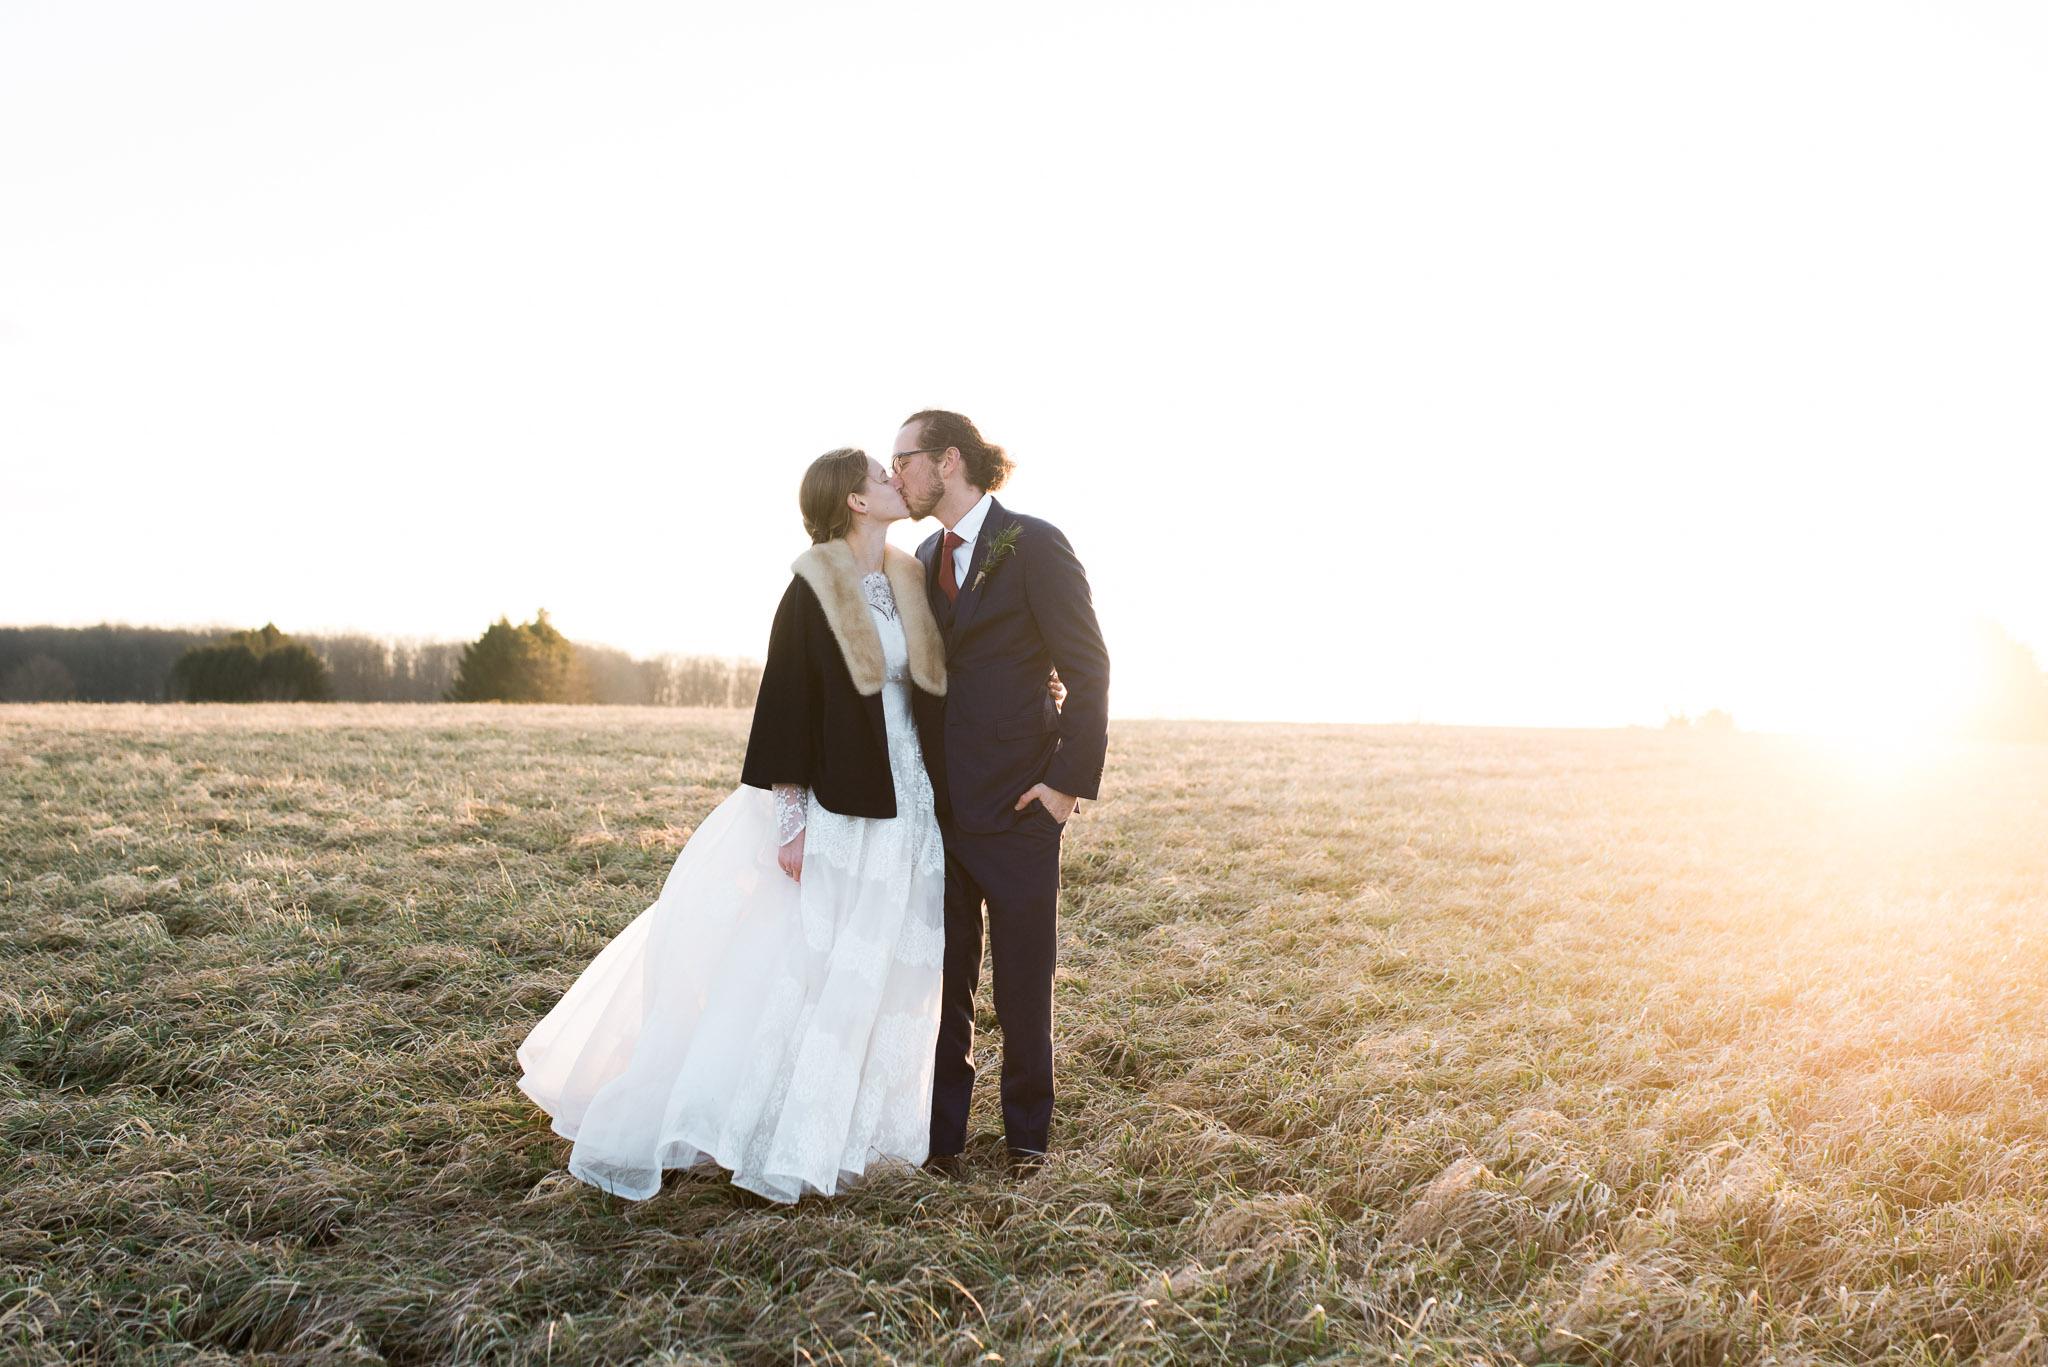 Western PA wedding photographer, wedding couple portraits, mariah fisher photography-7055.jpg